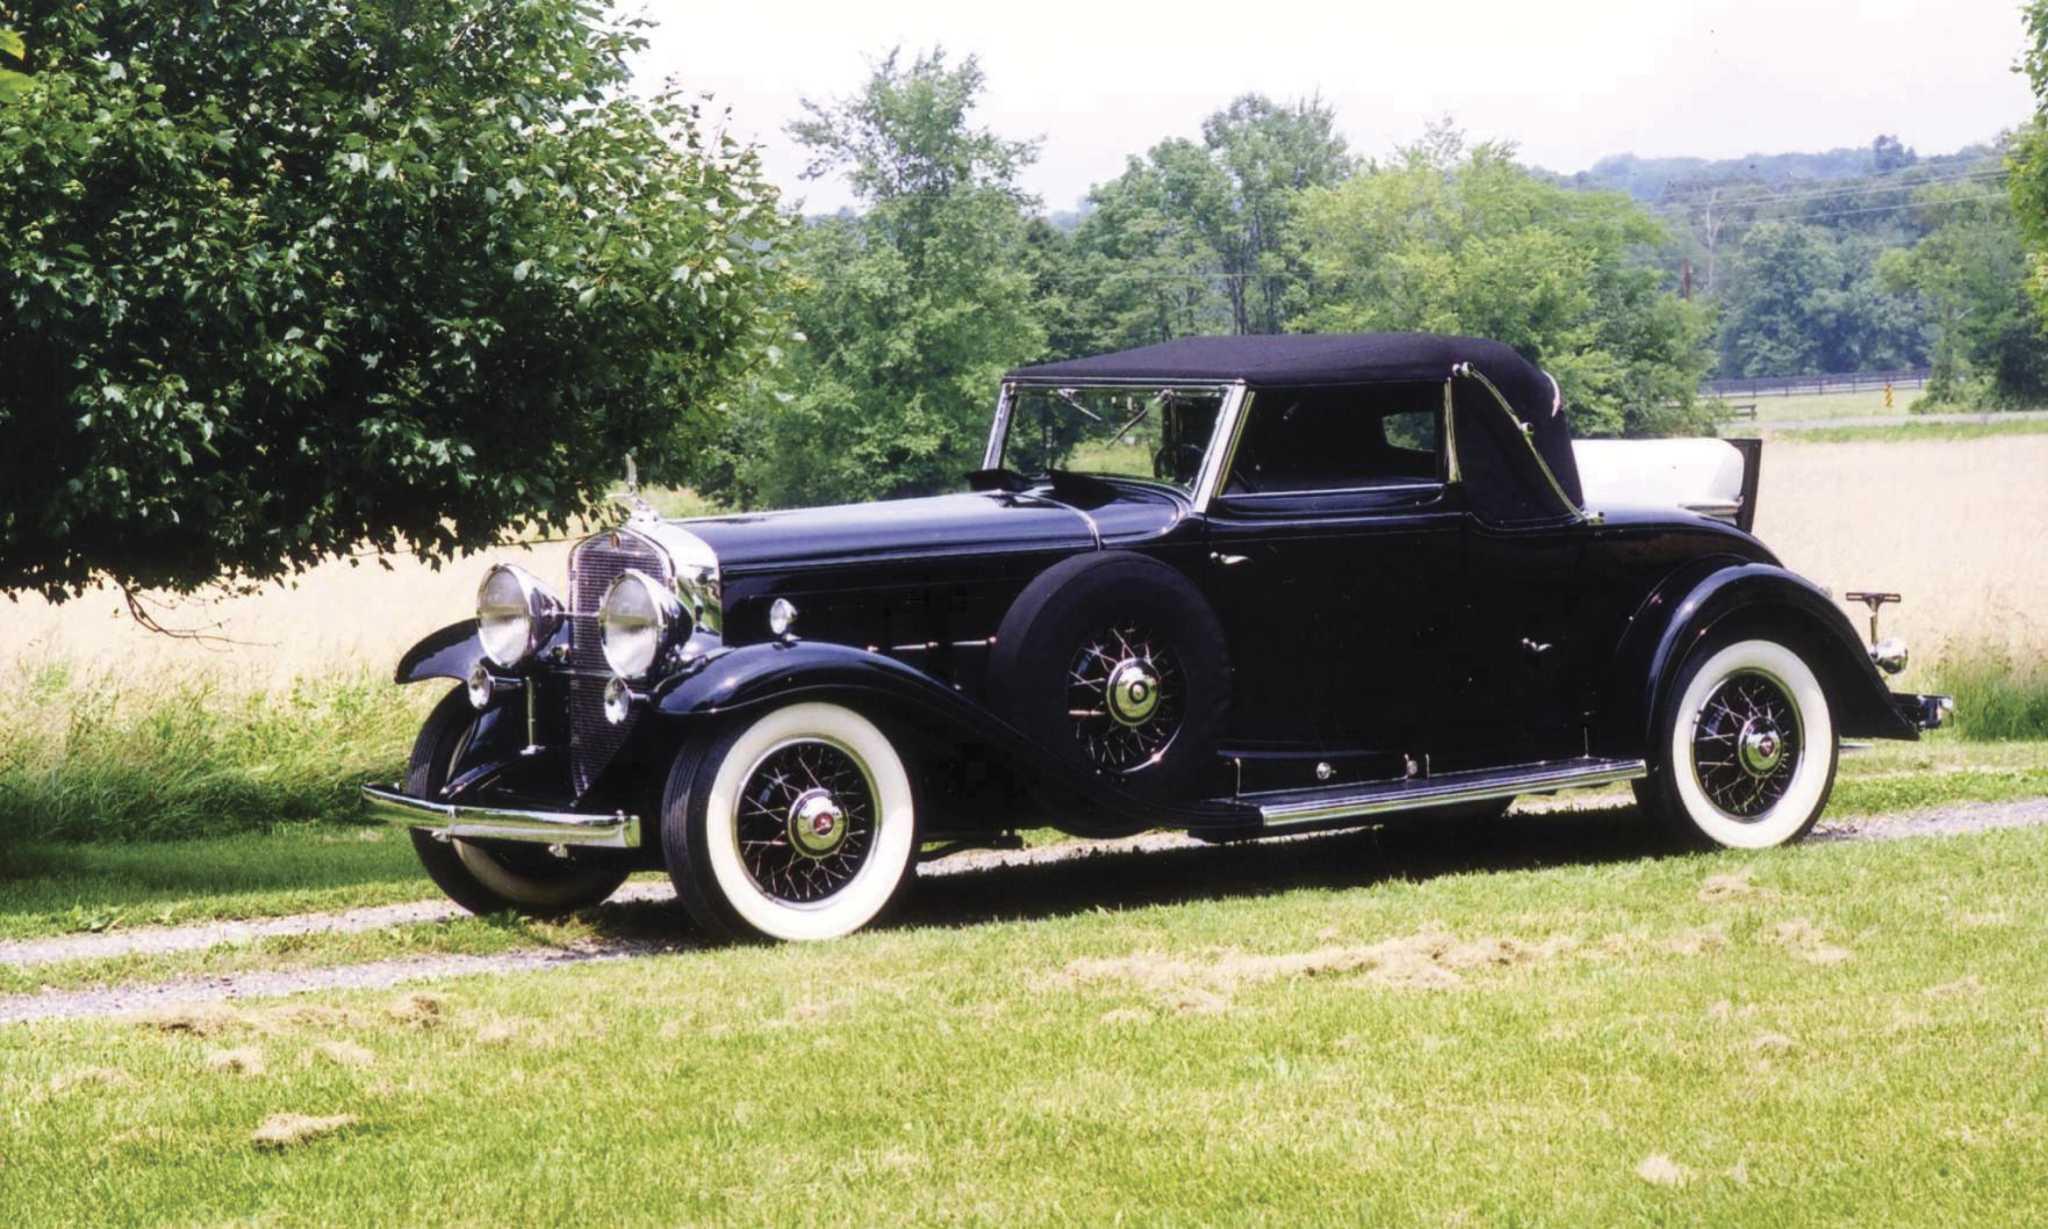 1931 Cadillac convertible coupe has V-16, golf bag doors